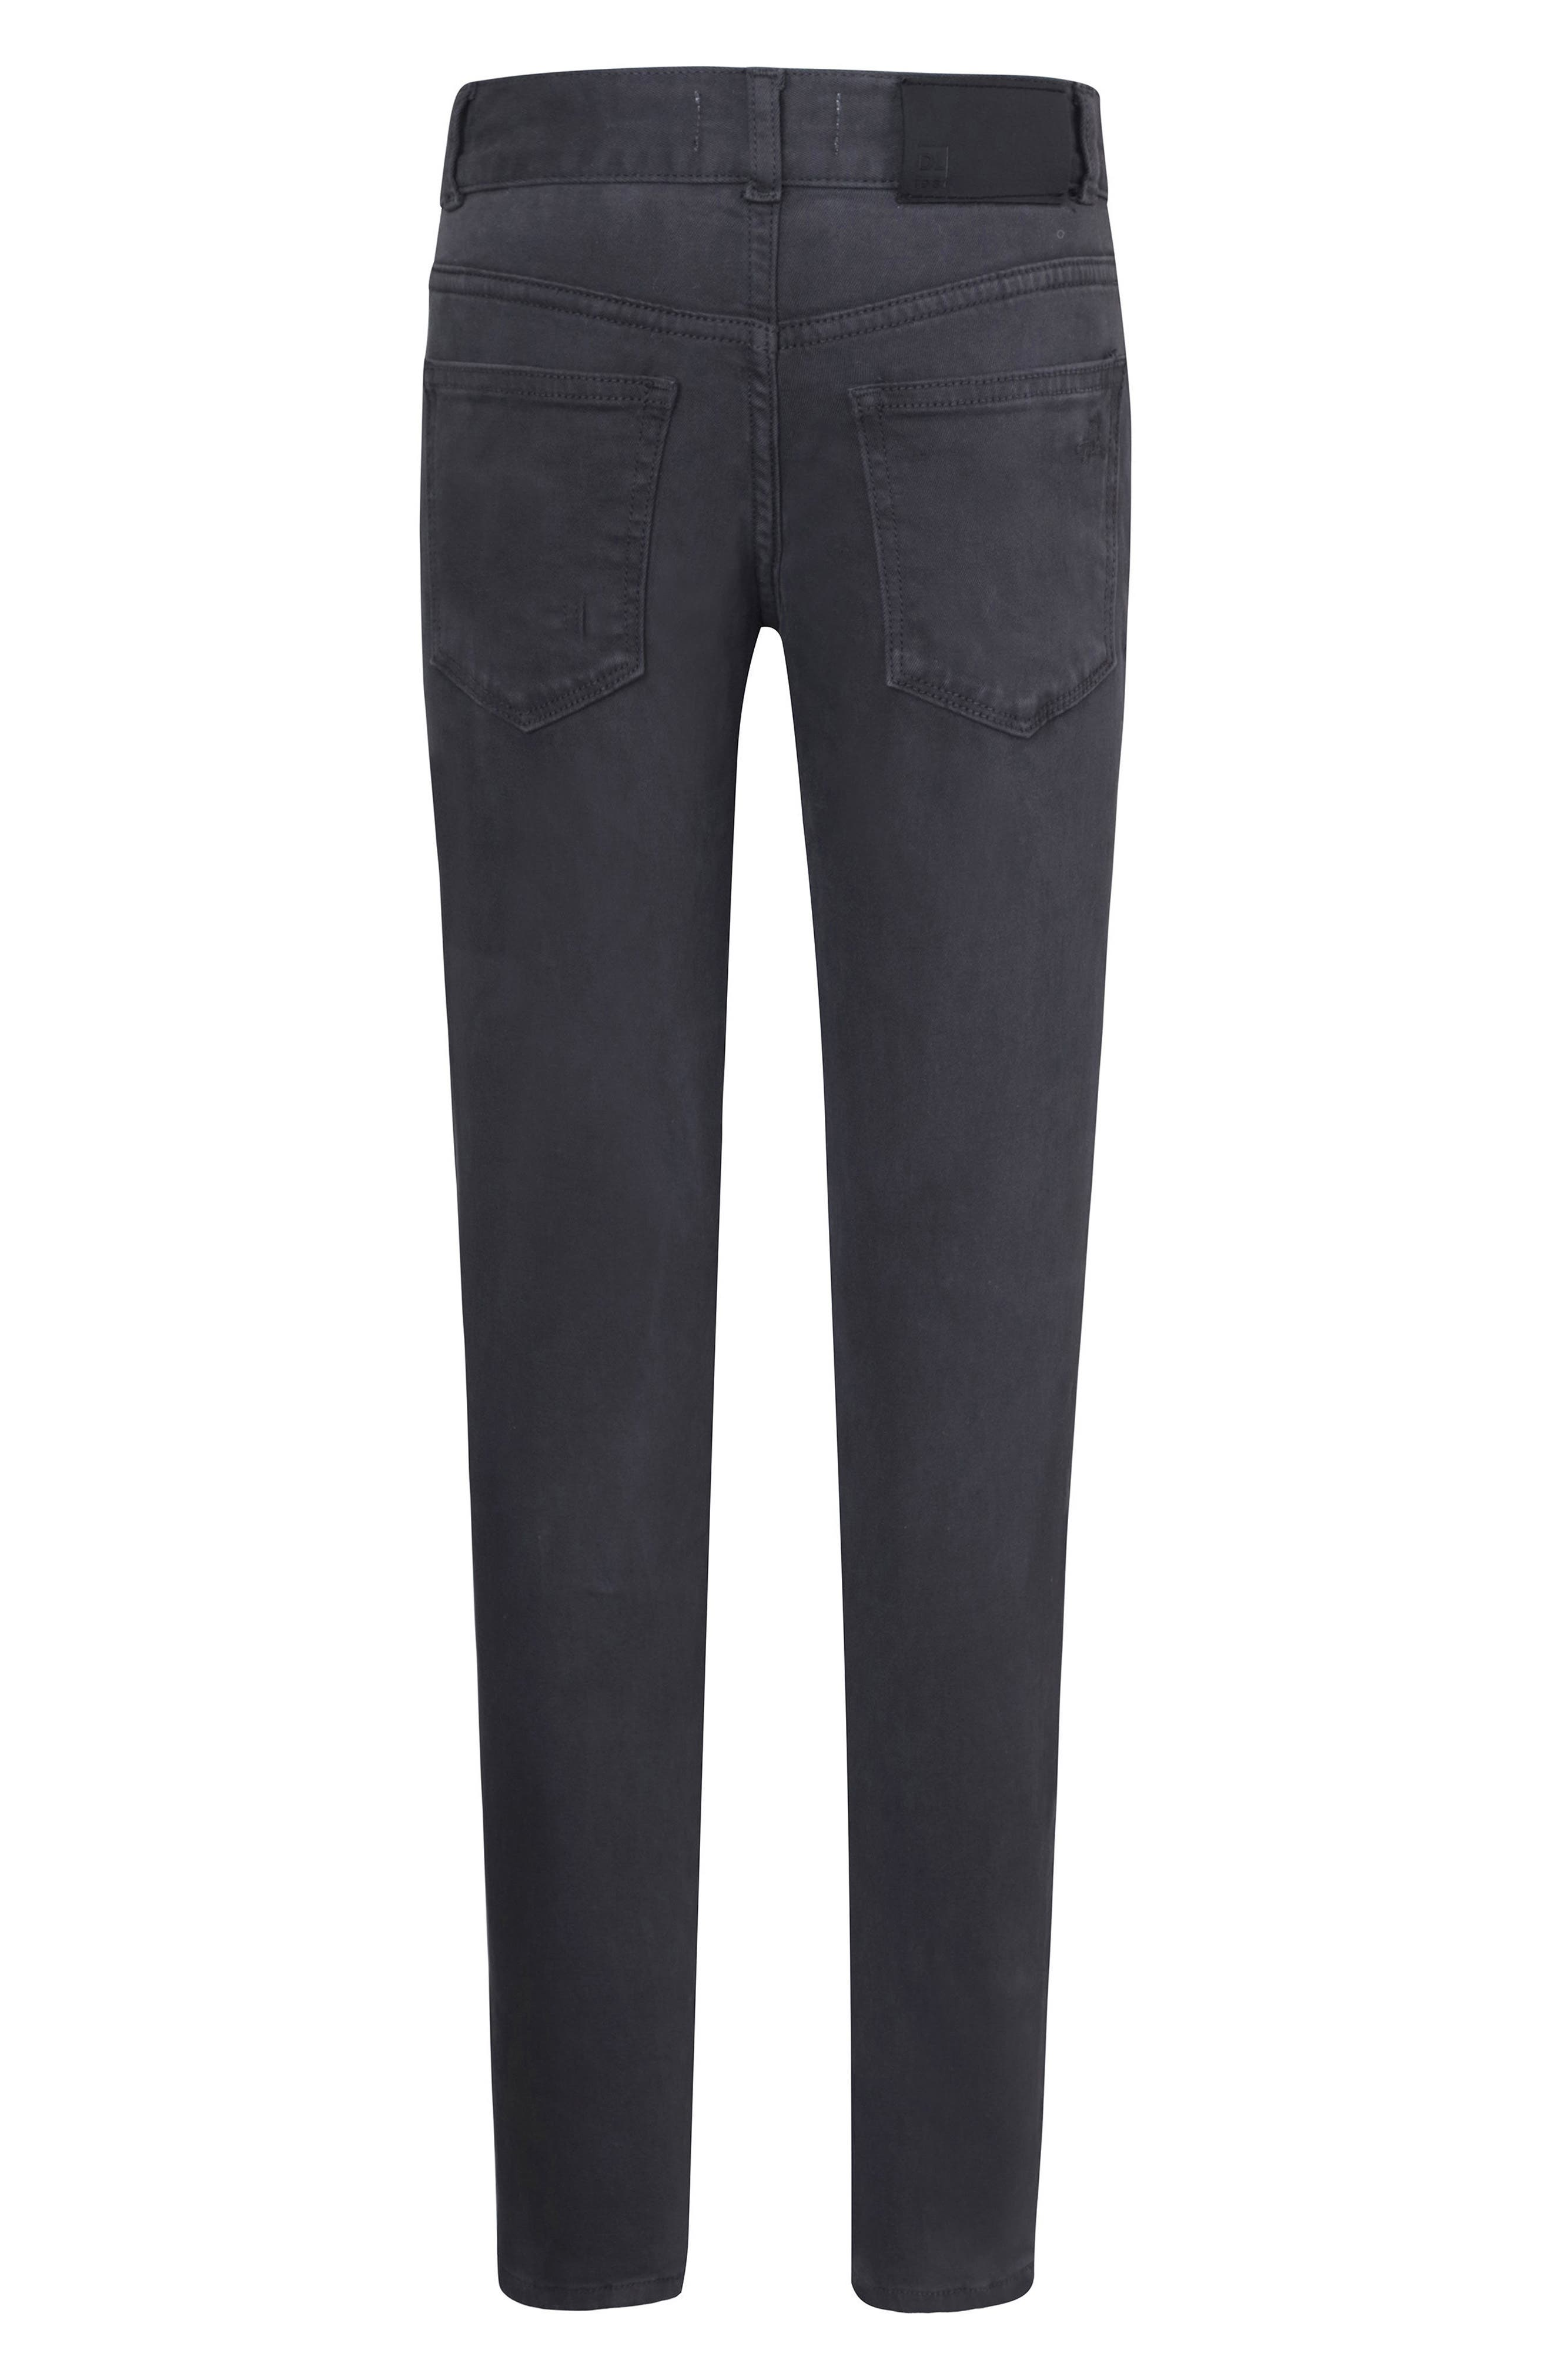 Hawke Skinny Jeans,                             Alternate thumbnail 2, color,                             DAB